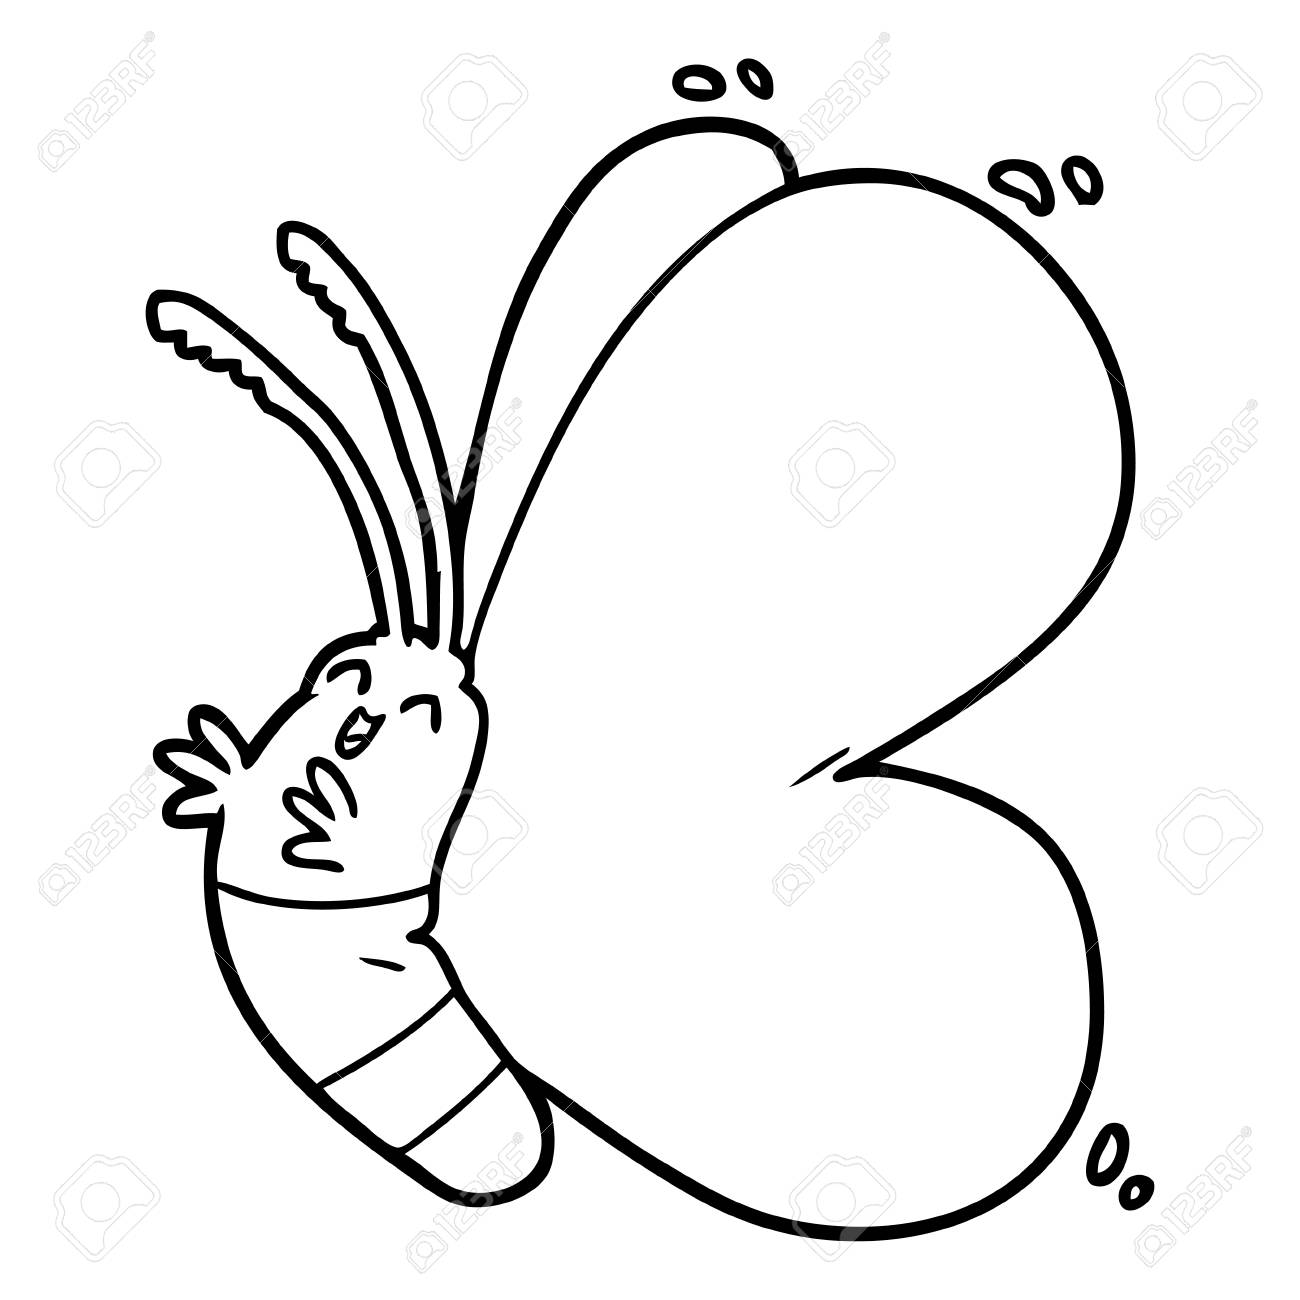 funny cartoon butterfly - 94883707